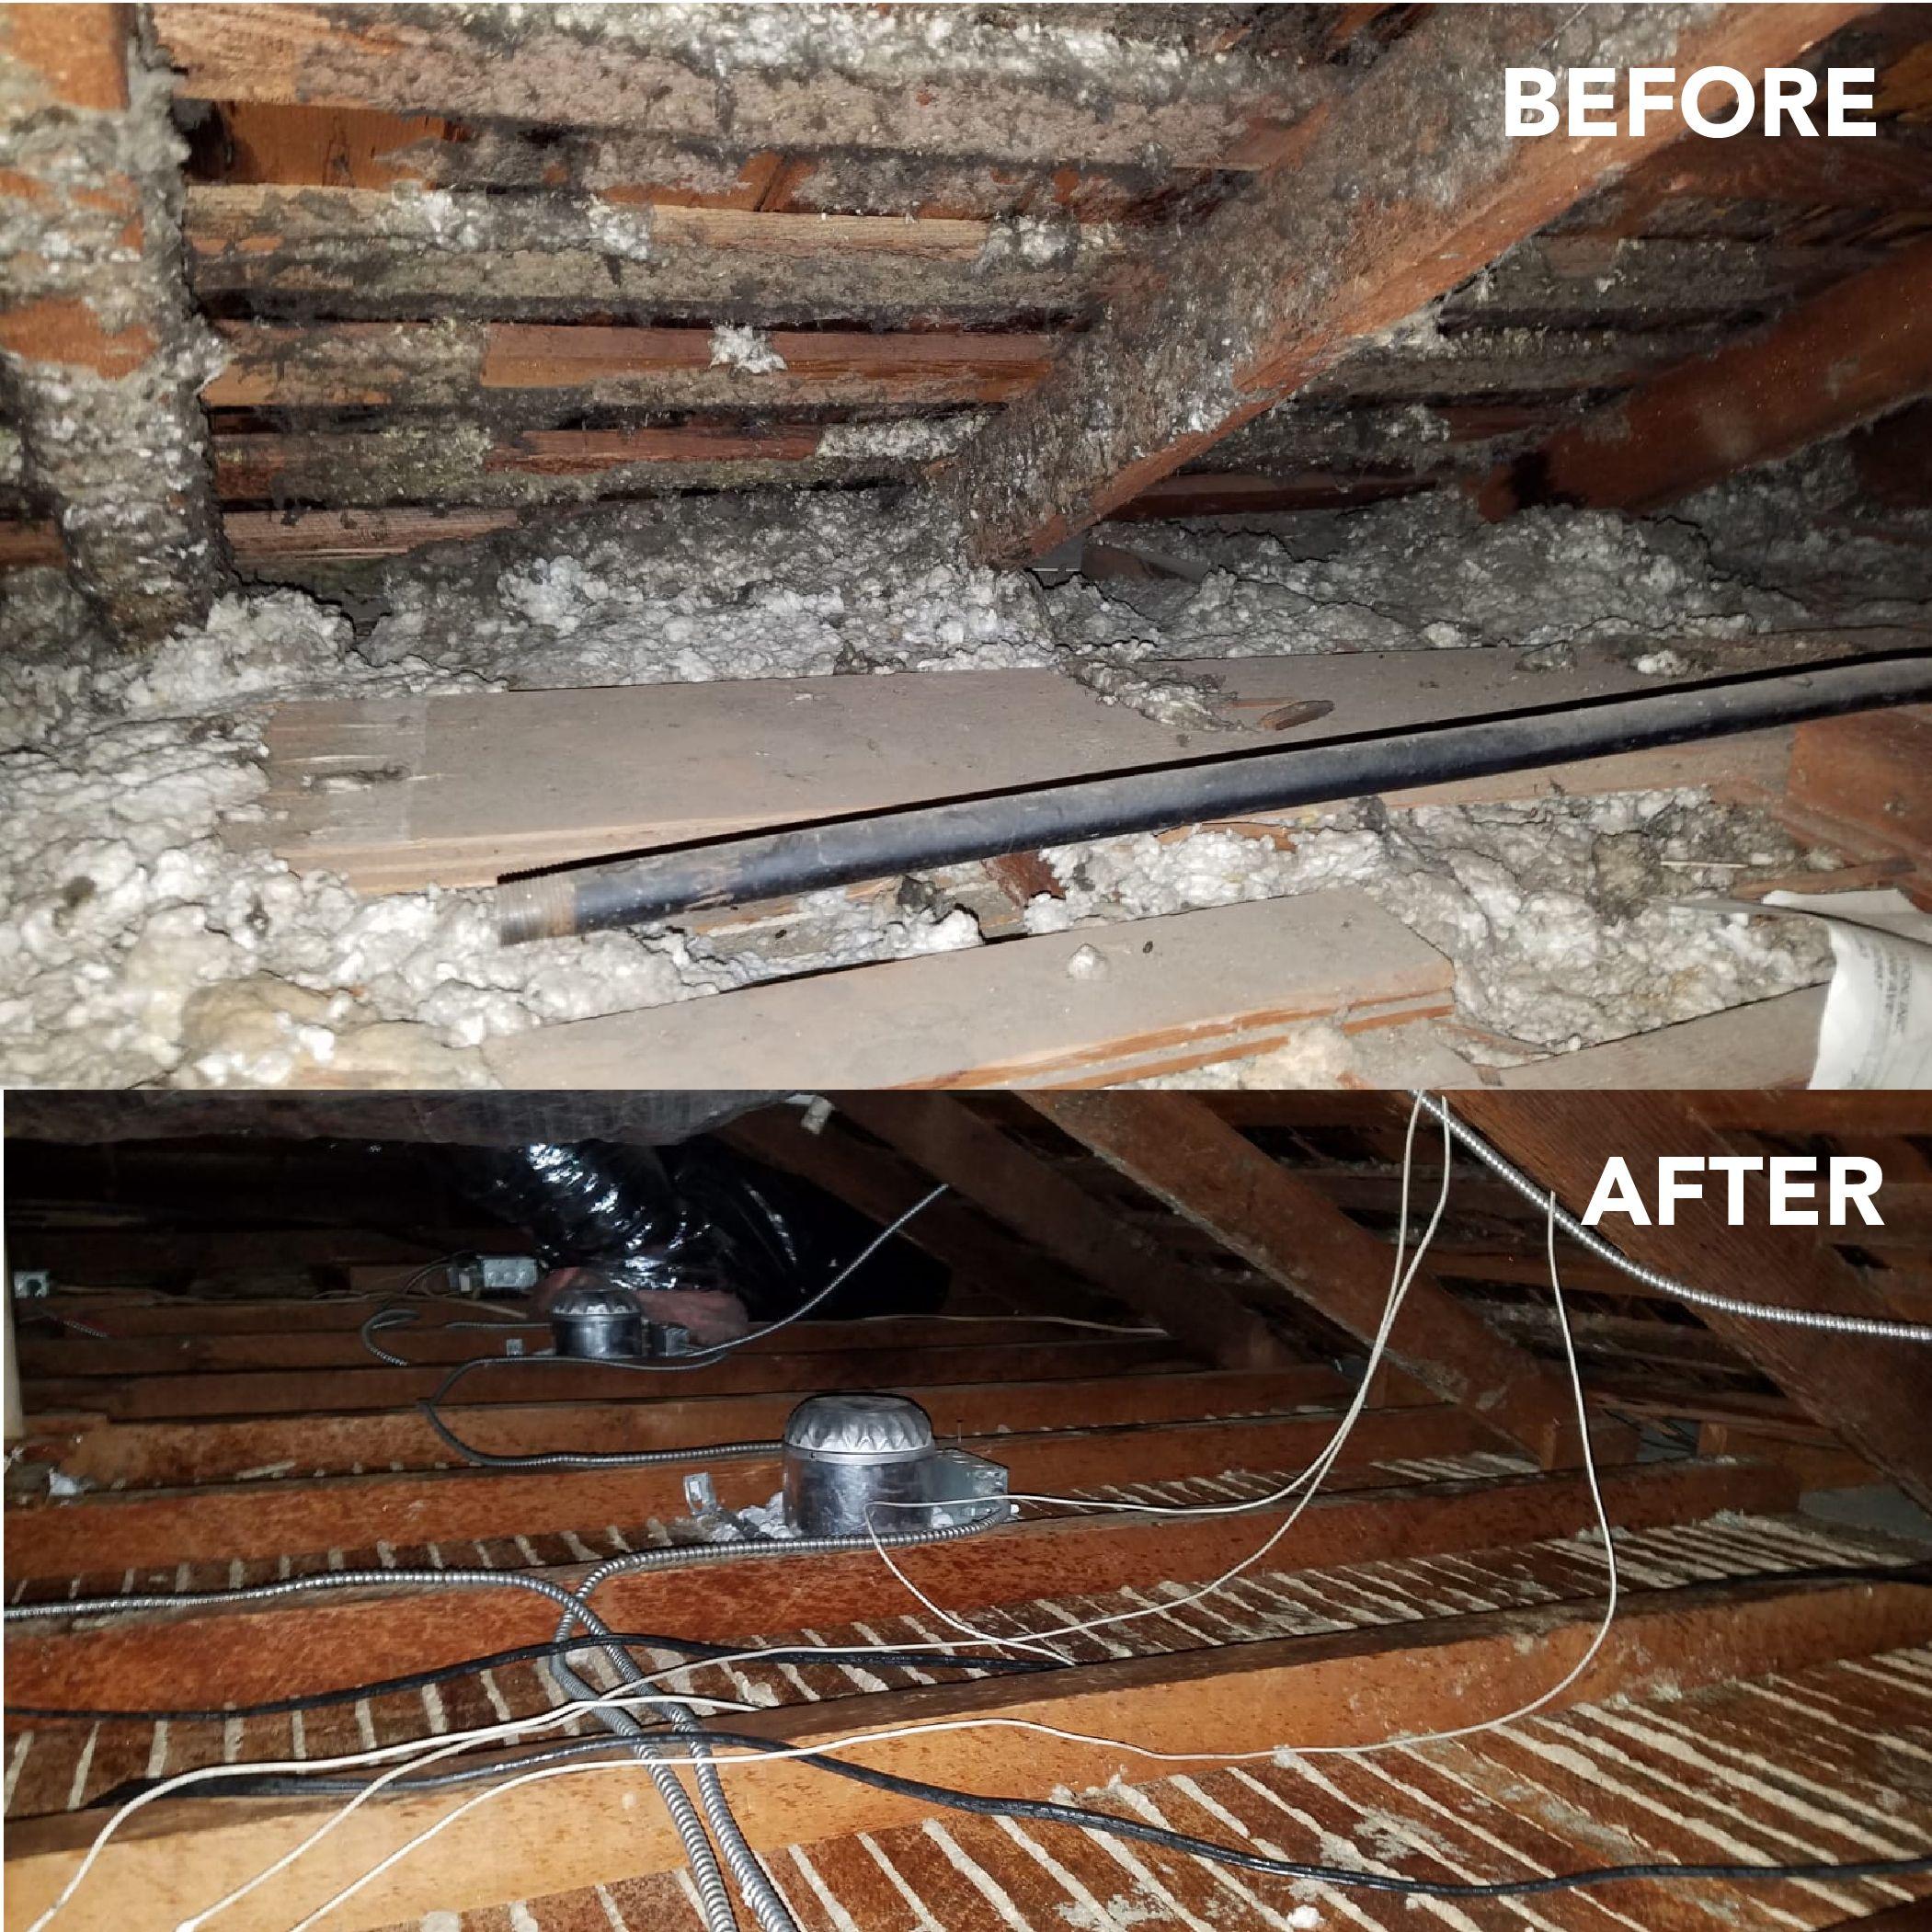 Attic Decontamination Rodents Cleanup Attic Insulation Removal Attic Insulation Insulation Removal